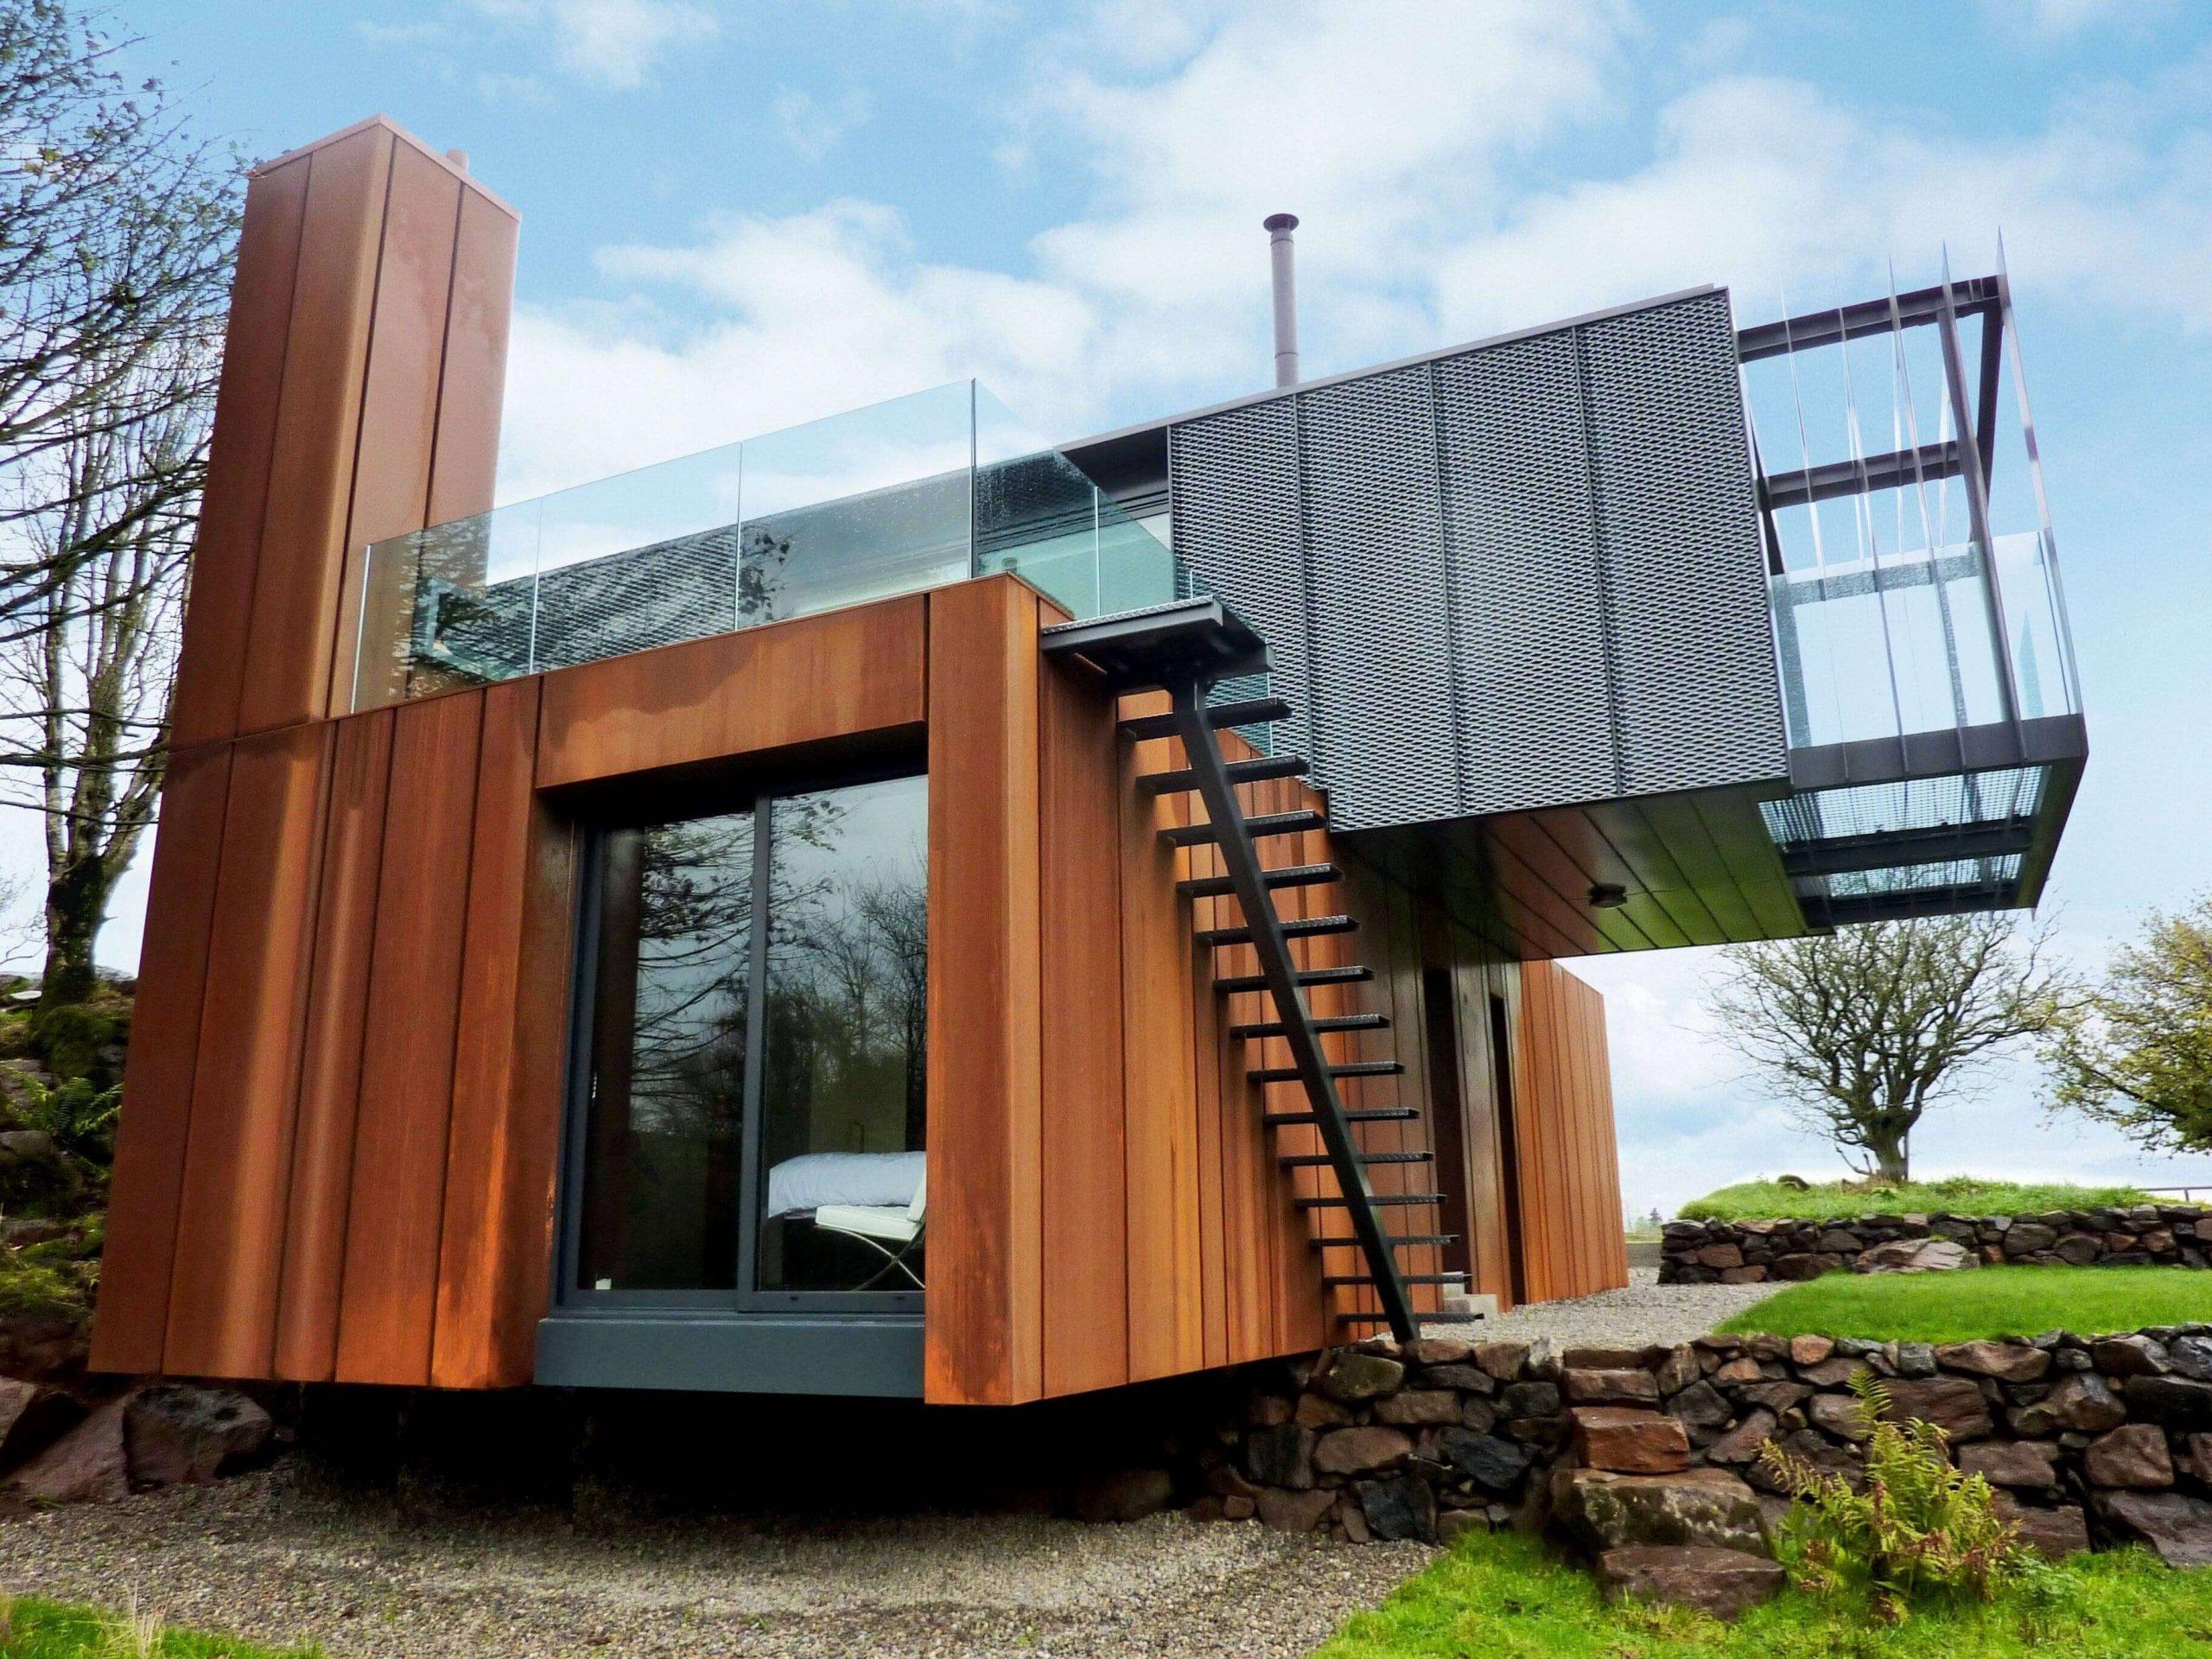 Une Incroyable Maison Container En Irlande Inspirebox